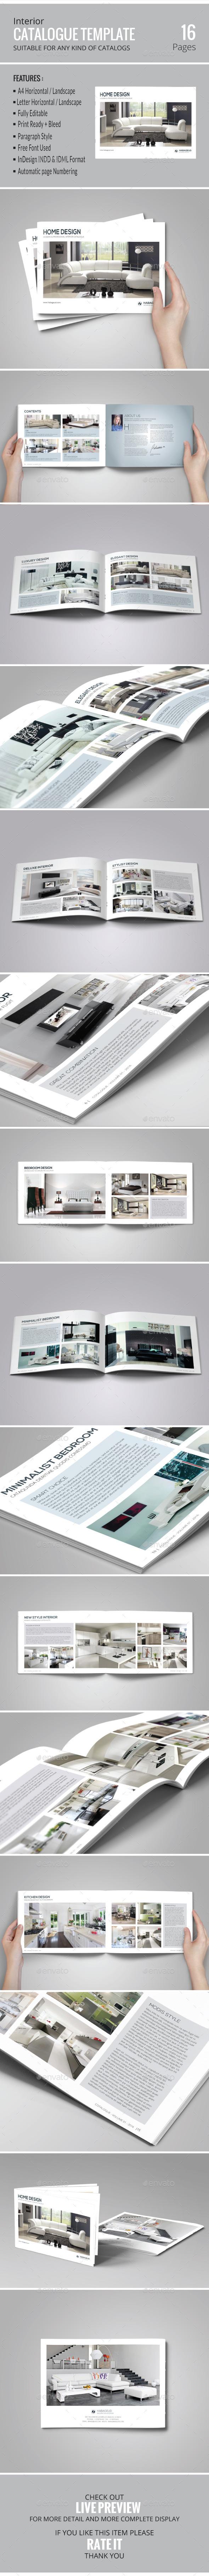 GraphicRiver Catalog Template Vol 04 8976868